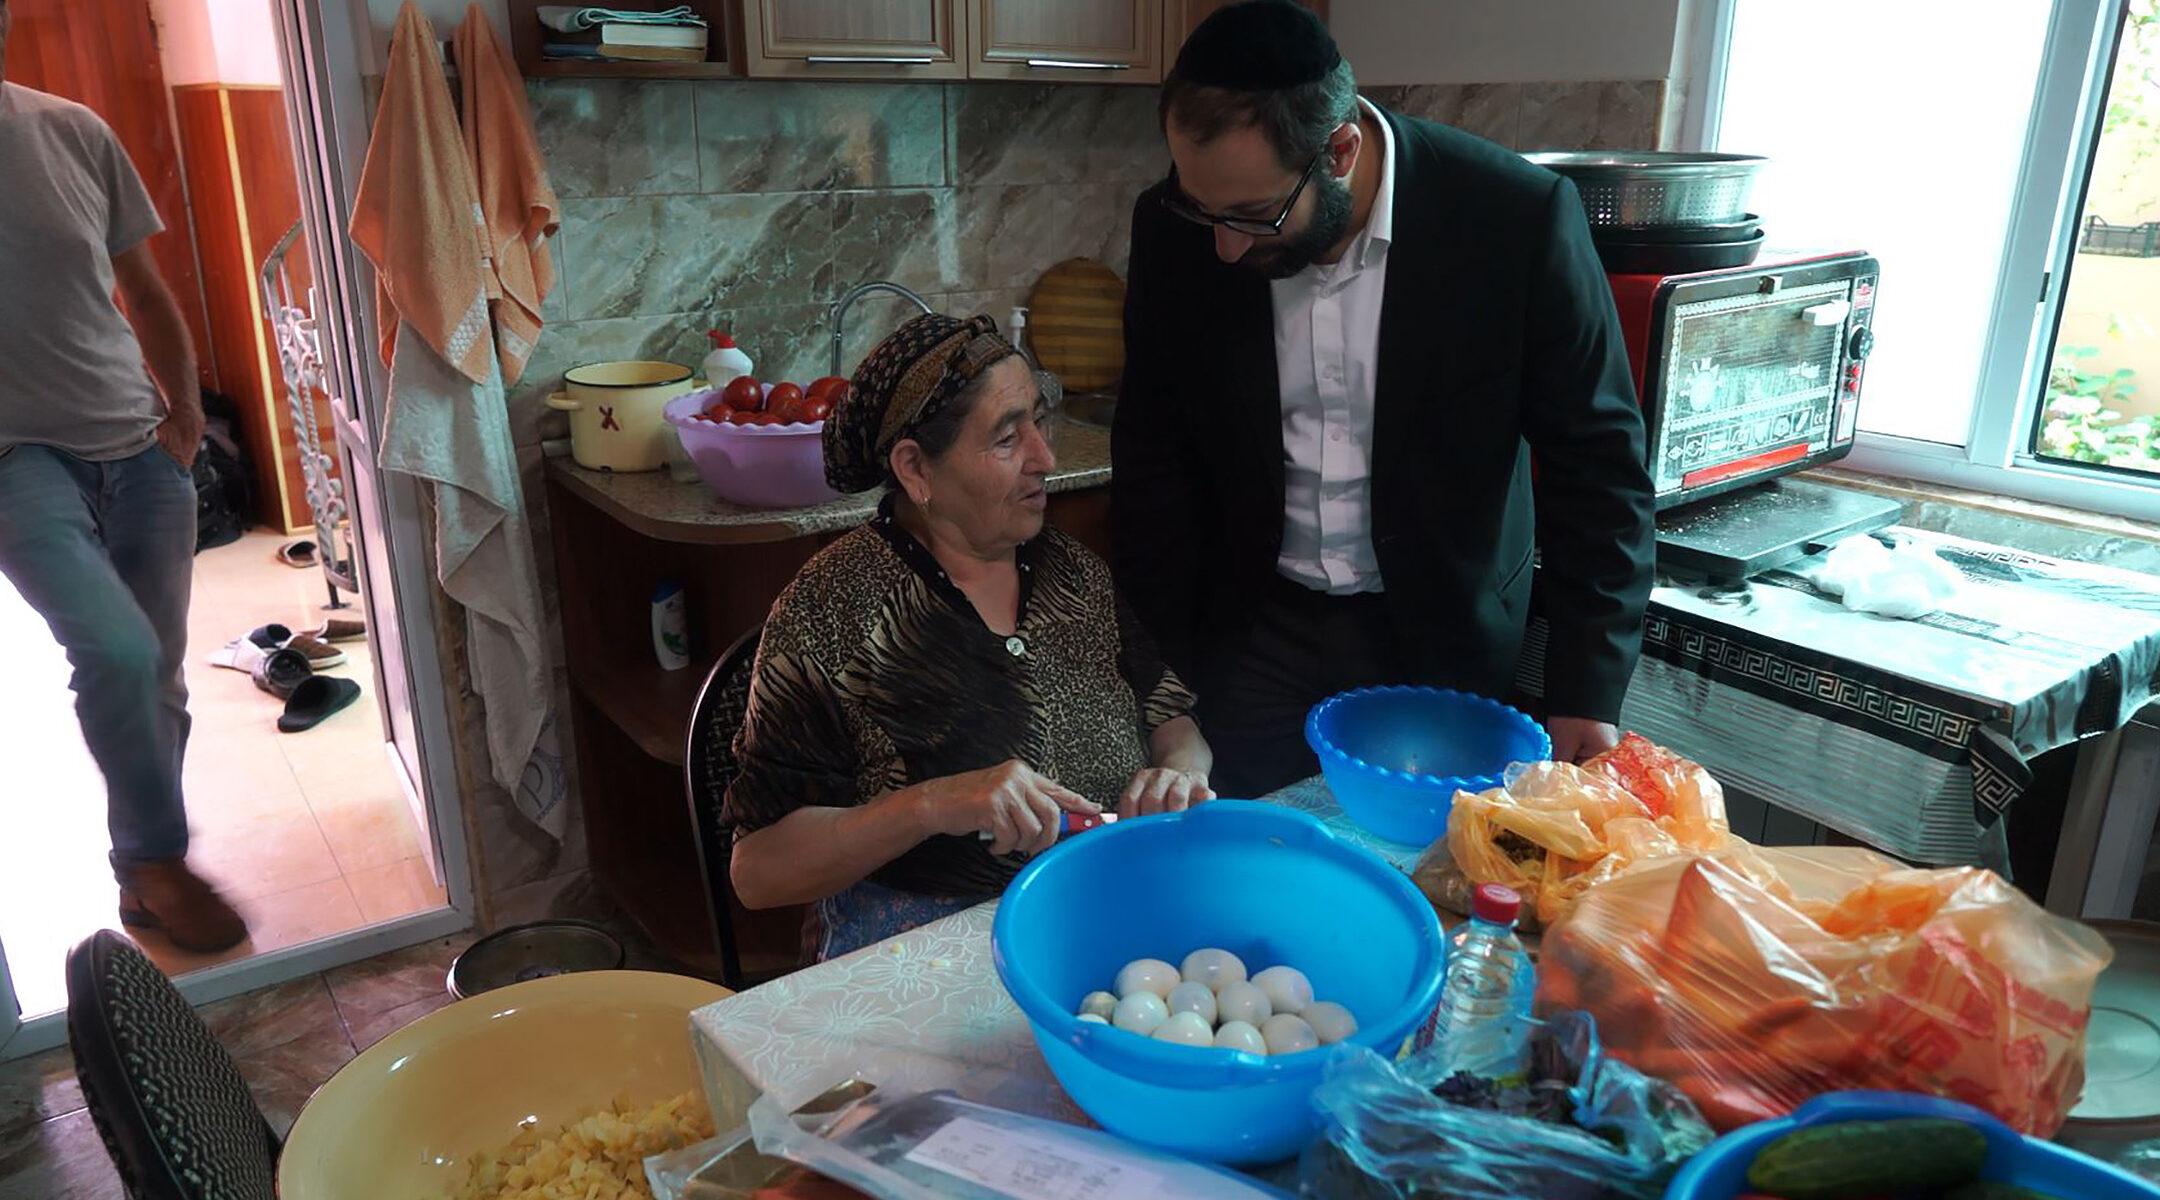 Zoya Avadayev discusses cooking Jewish dishes with Rabbi Tsadok Ashurov Krasnaiya Sloboda, Azerbaijan on July 21, 2018. (Cnaan Liphshiz)